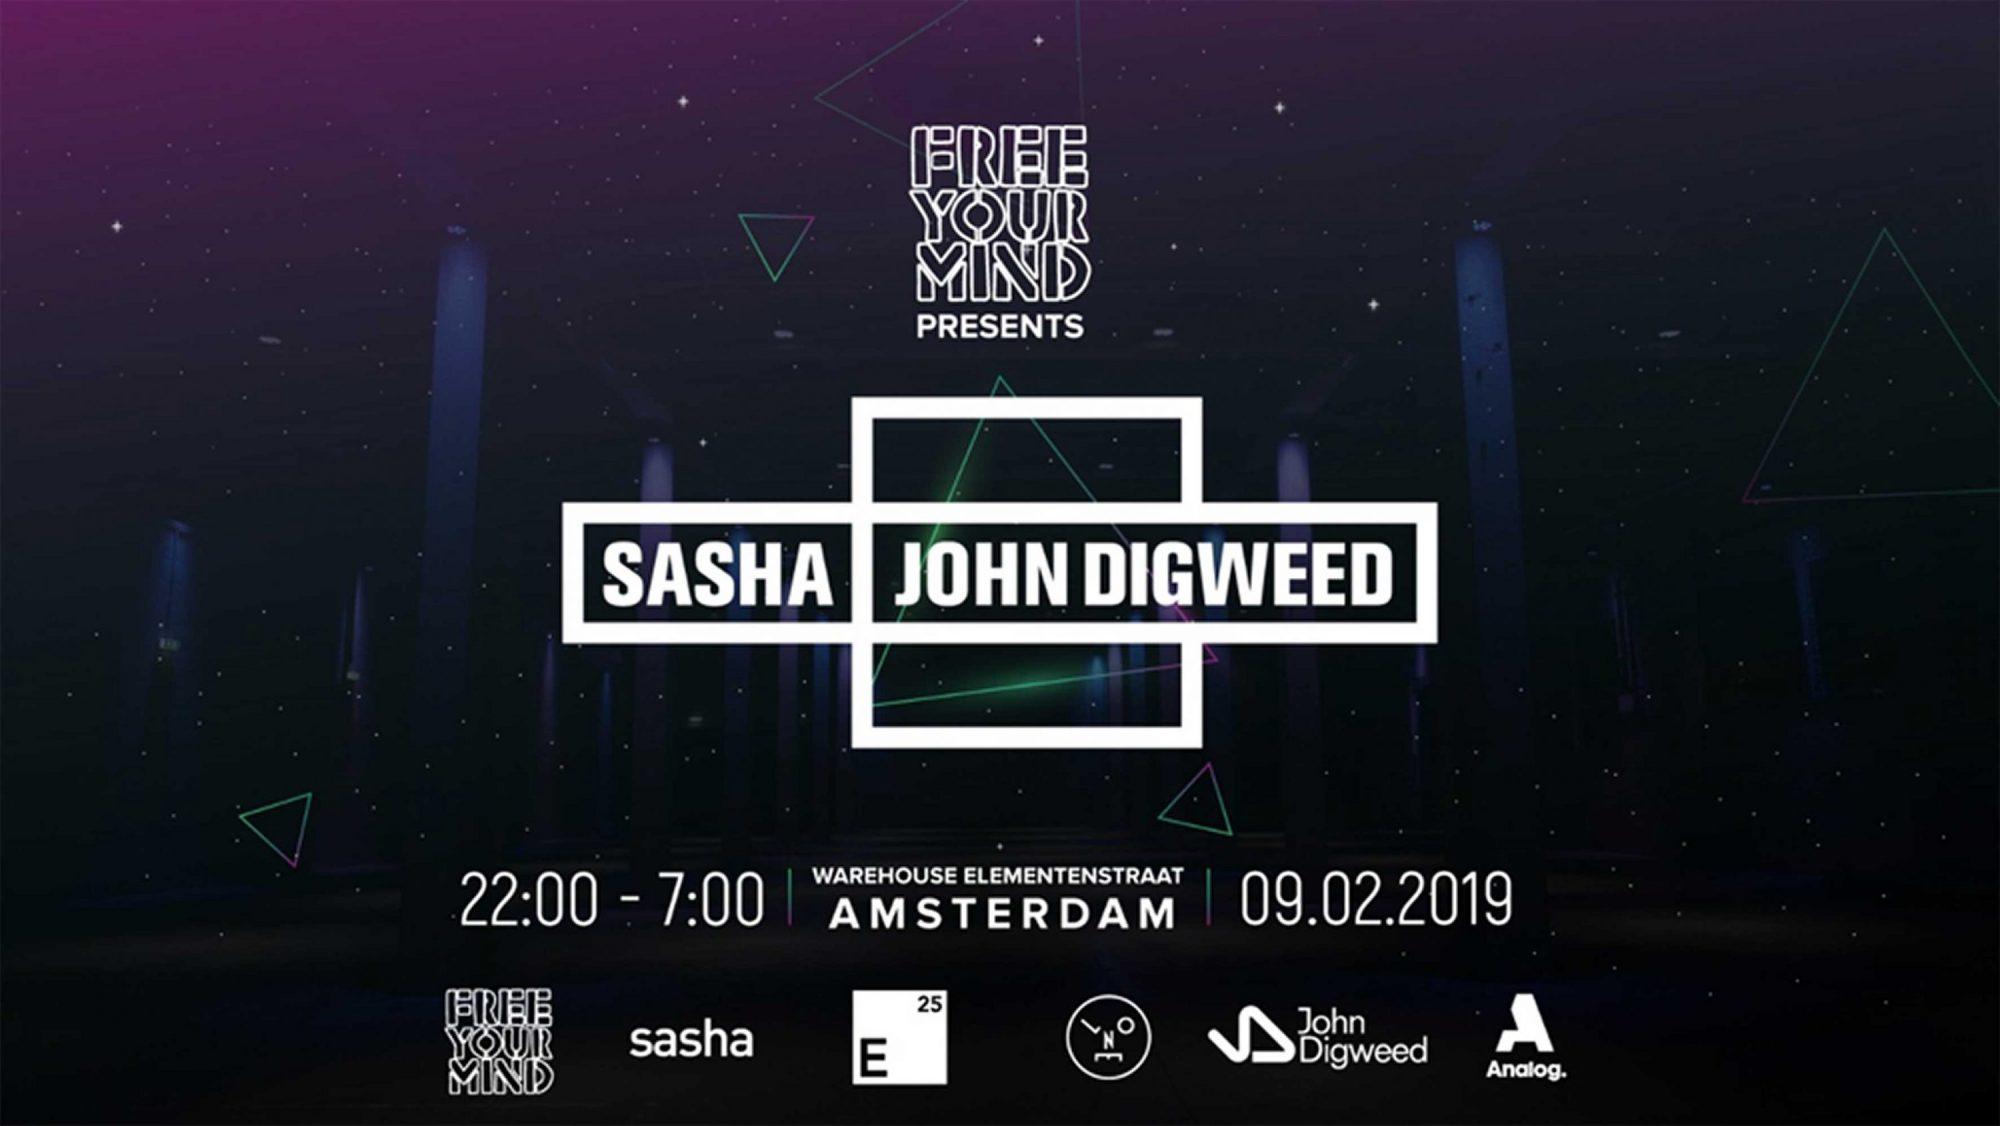 Sasha and John Digweed Free Your Mind